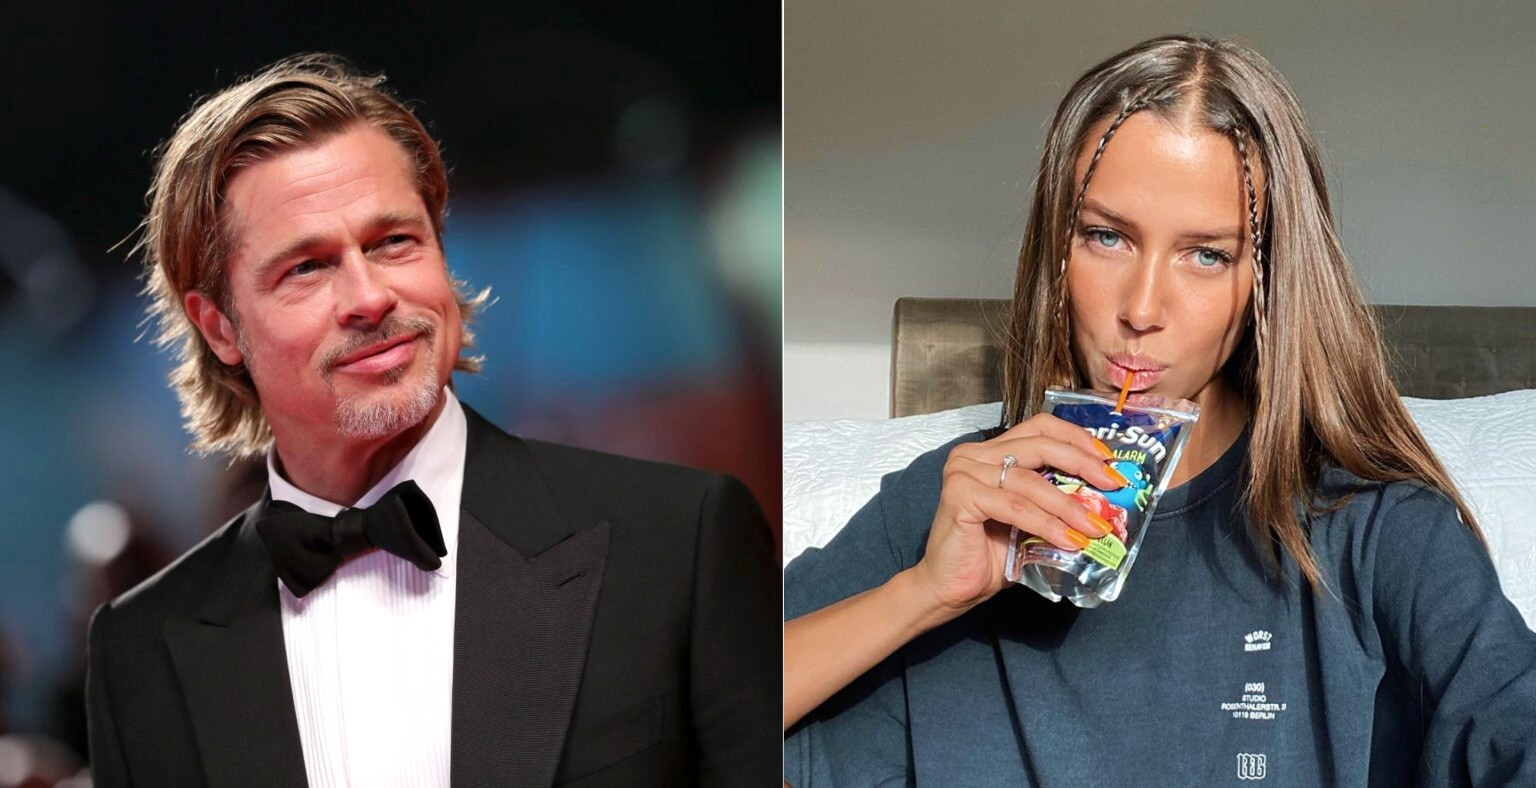 Brad Pitts Nye Boo Nicole Poturalski 27 Er Gift Med Roland Mary 68 730 No